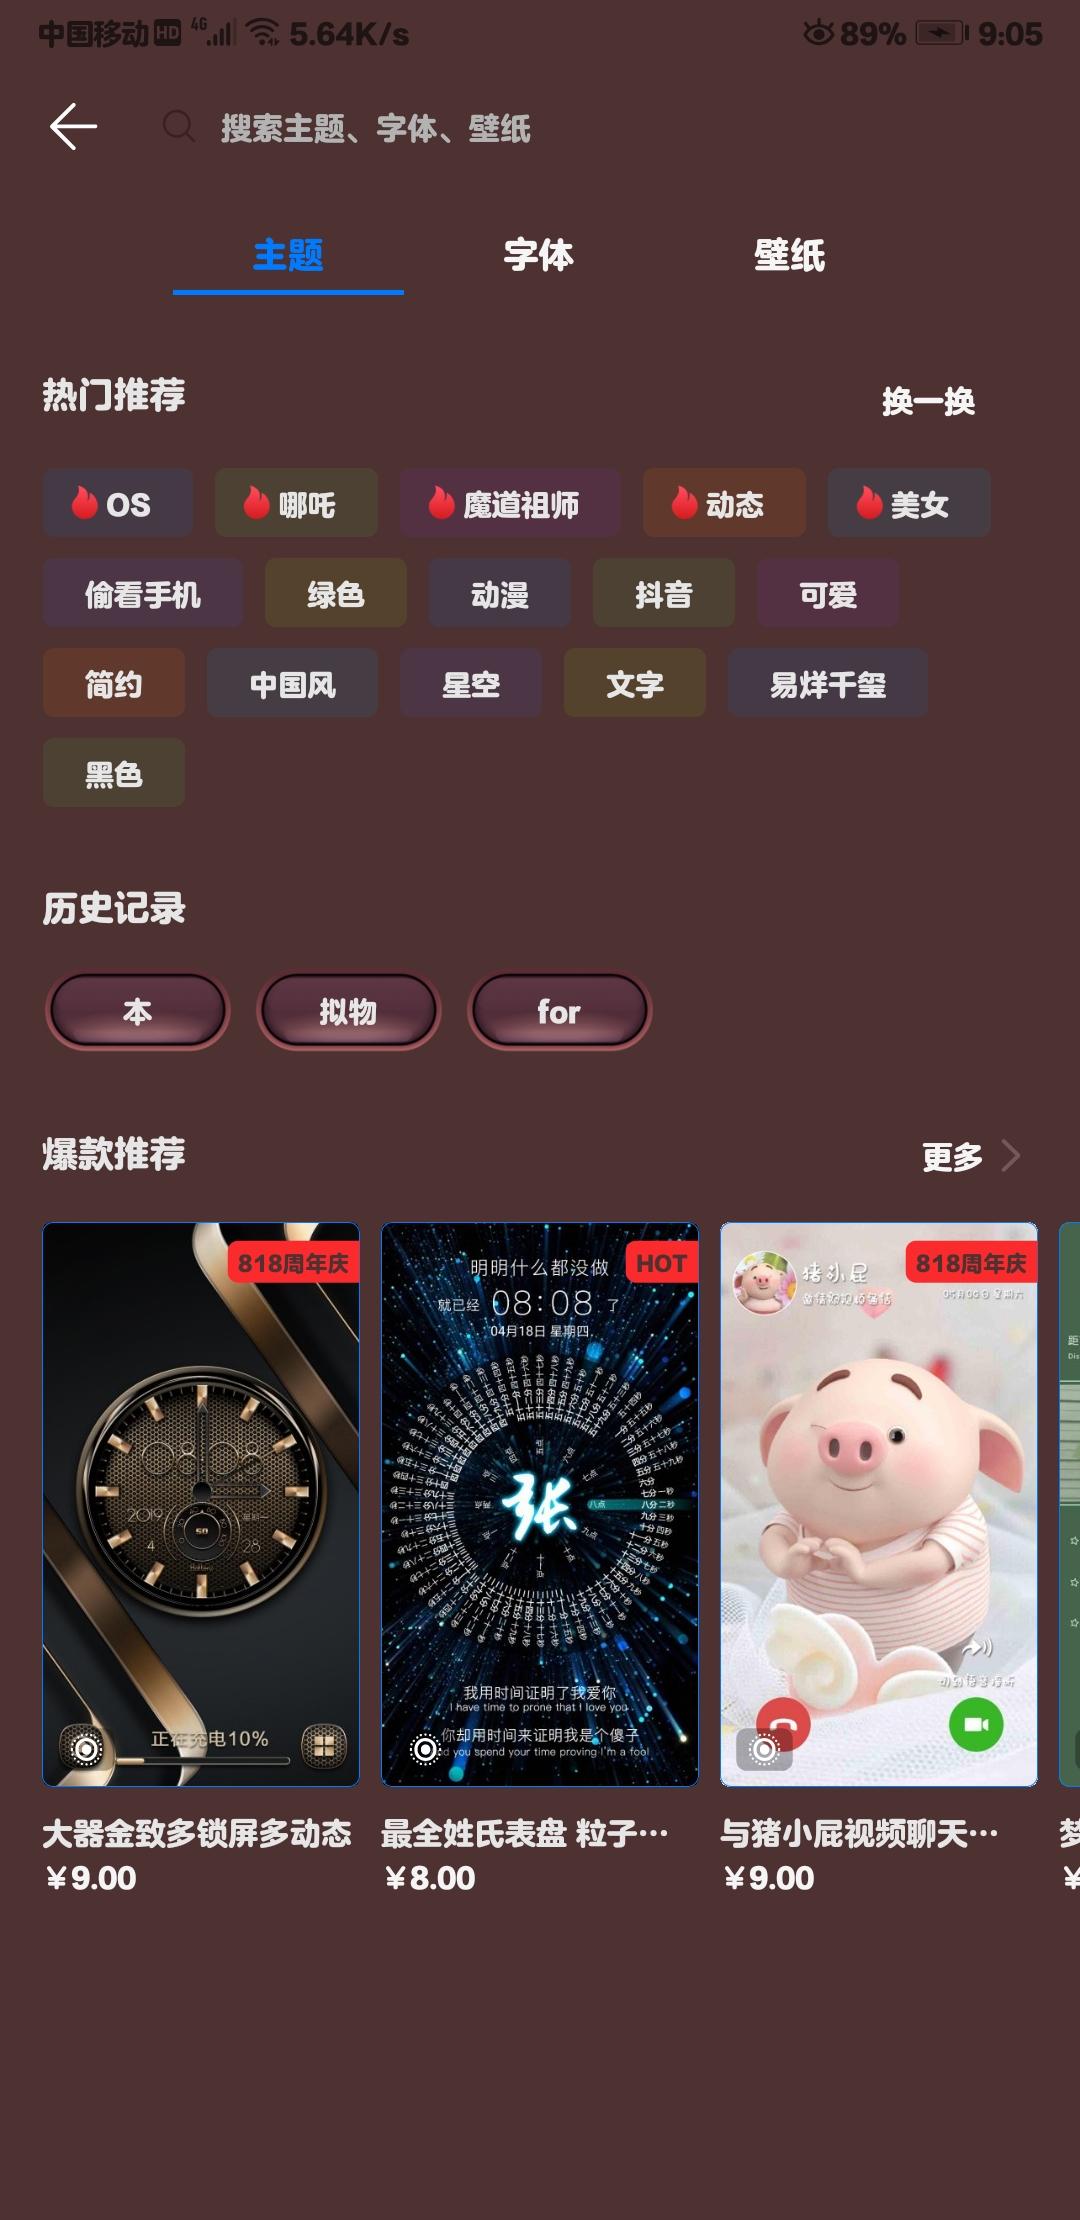 Screenshot_20190817_210504_com.huawei.android.thememanager.jpg